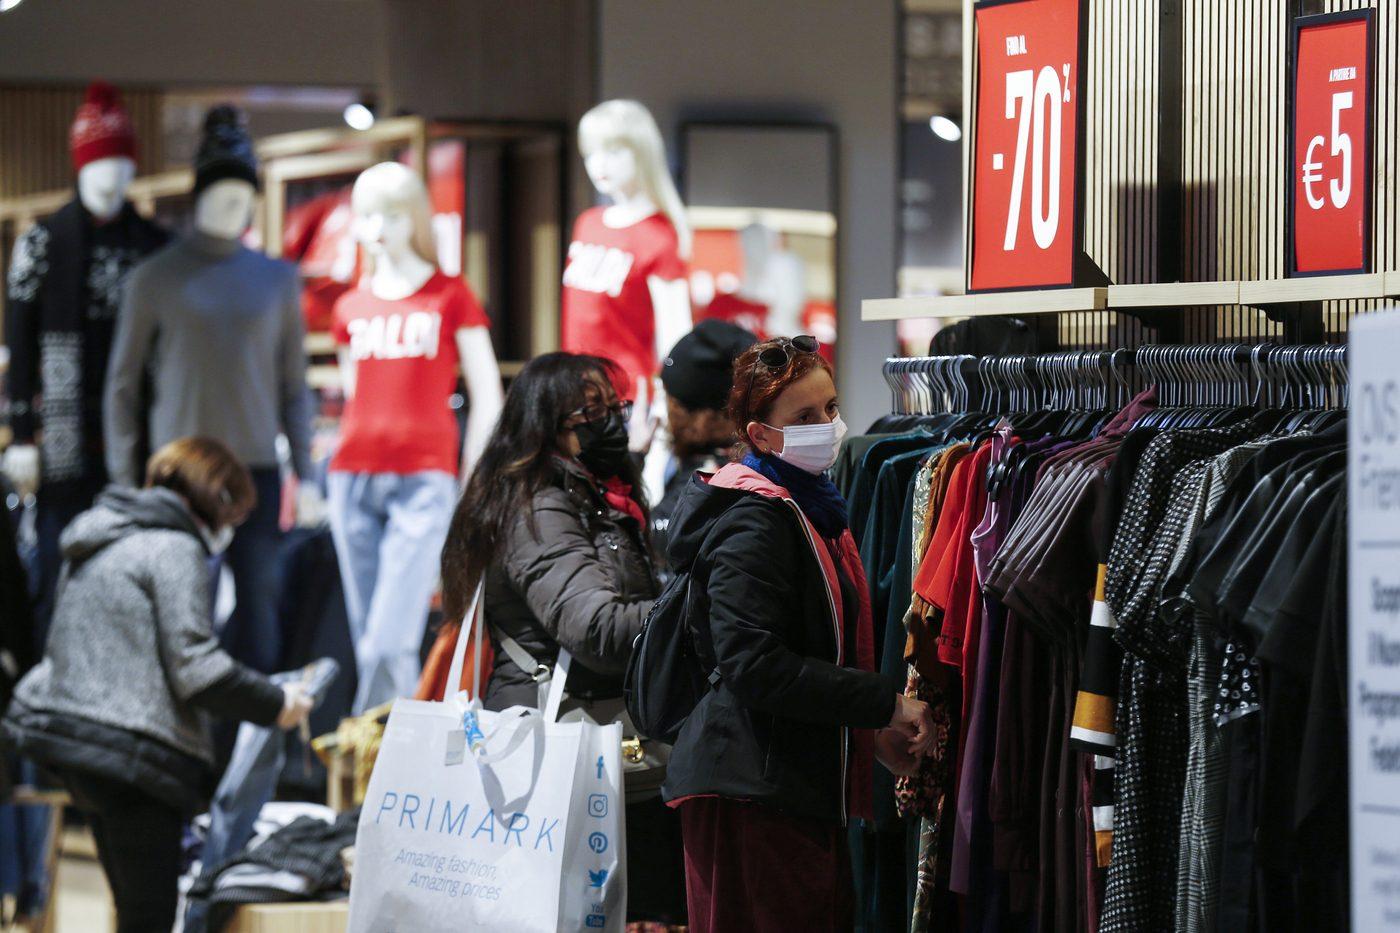 Saldi invernali a Roma 2021: orari d'apertura di negozi e centri ...